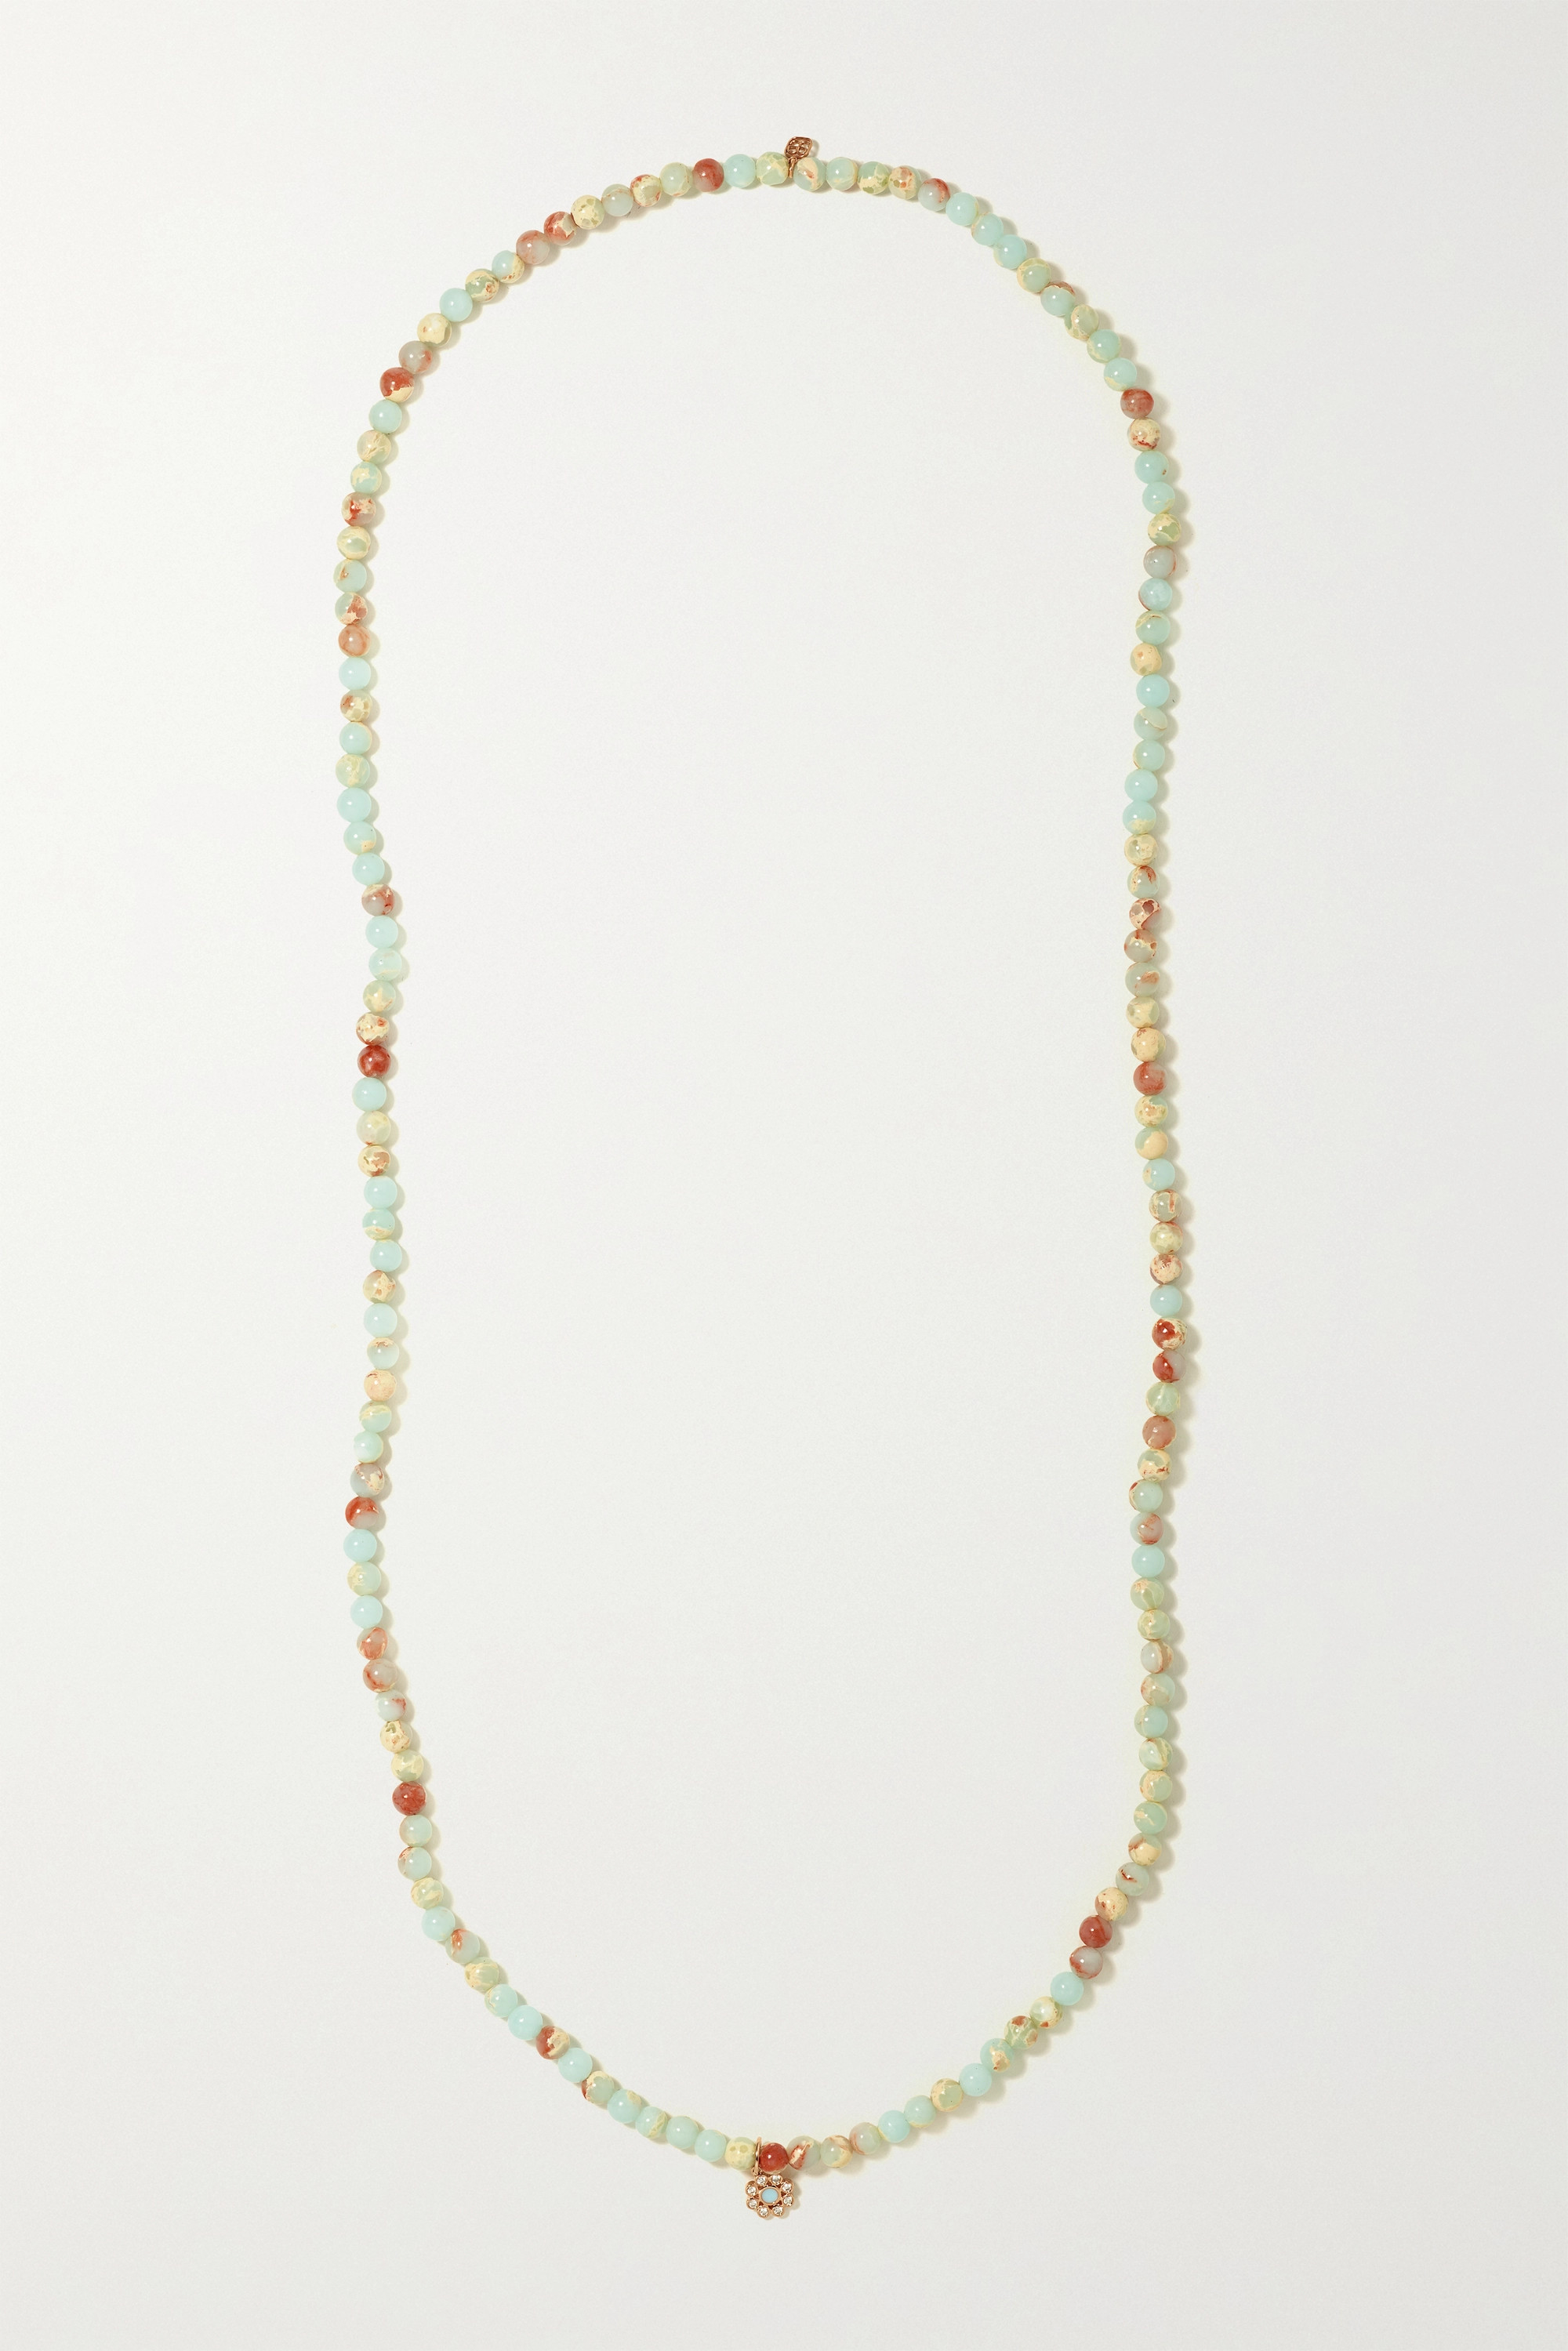 Sydney Evan - 14-karat rose gold, enamel, jasper and diamond necklace